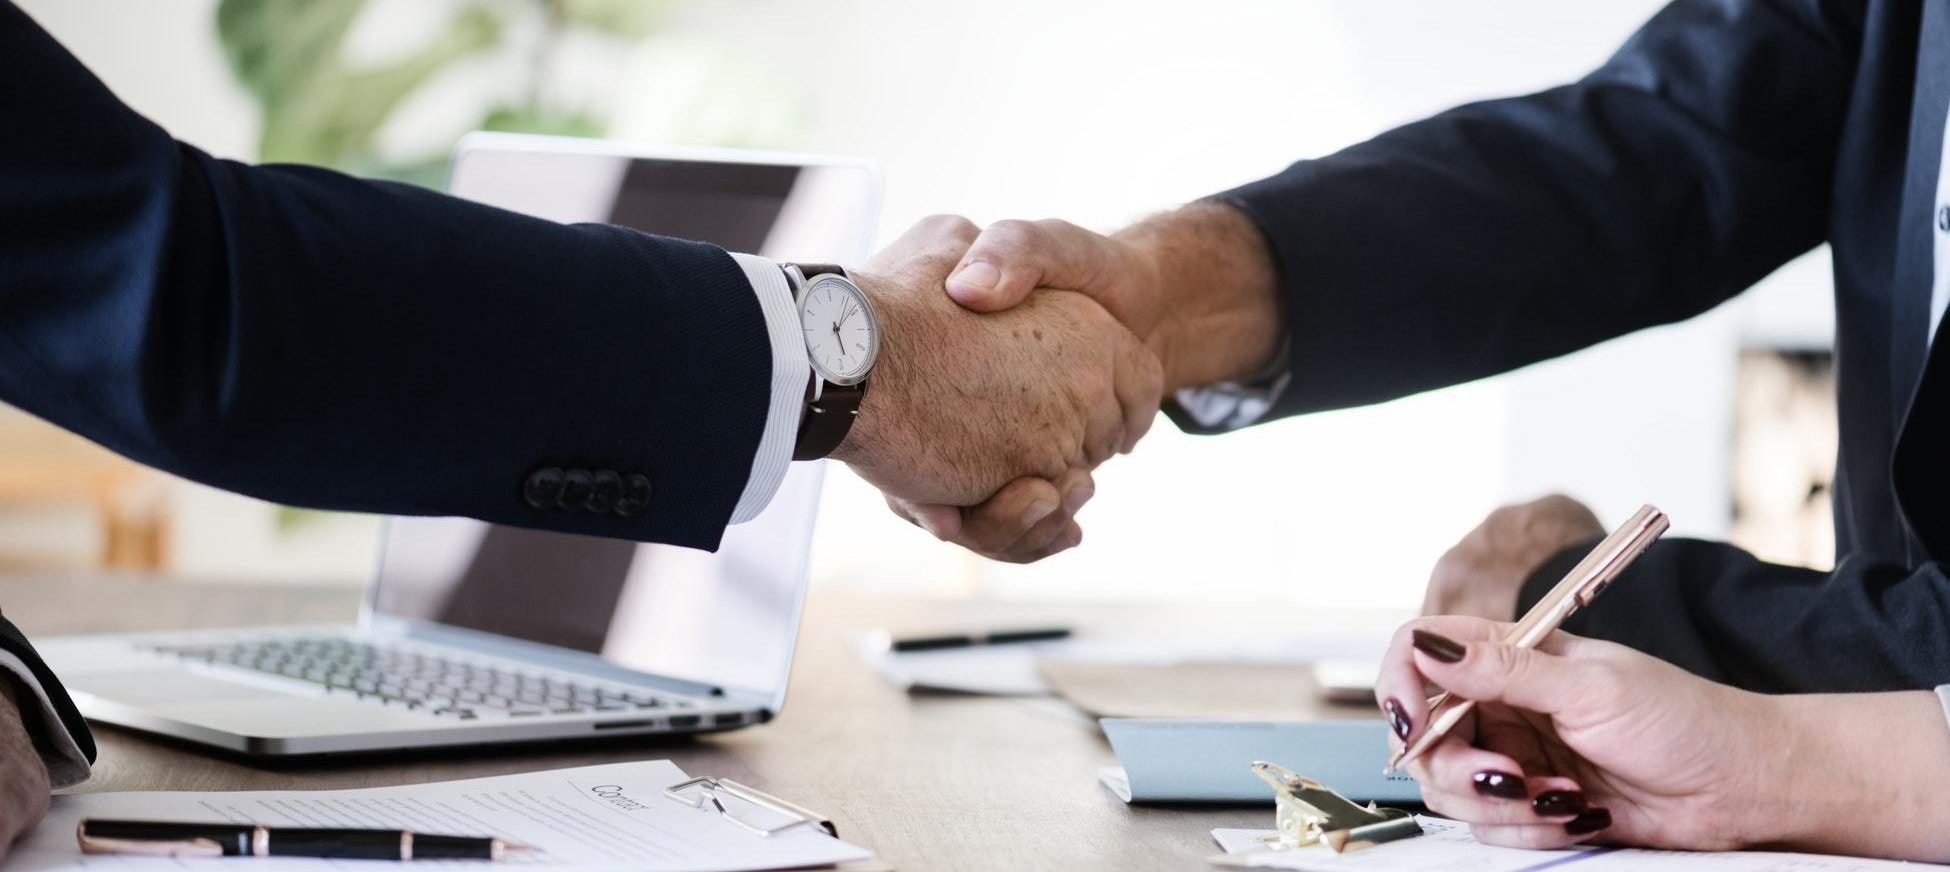 mobile-tec-handshake